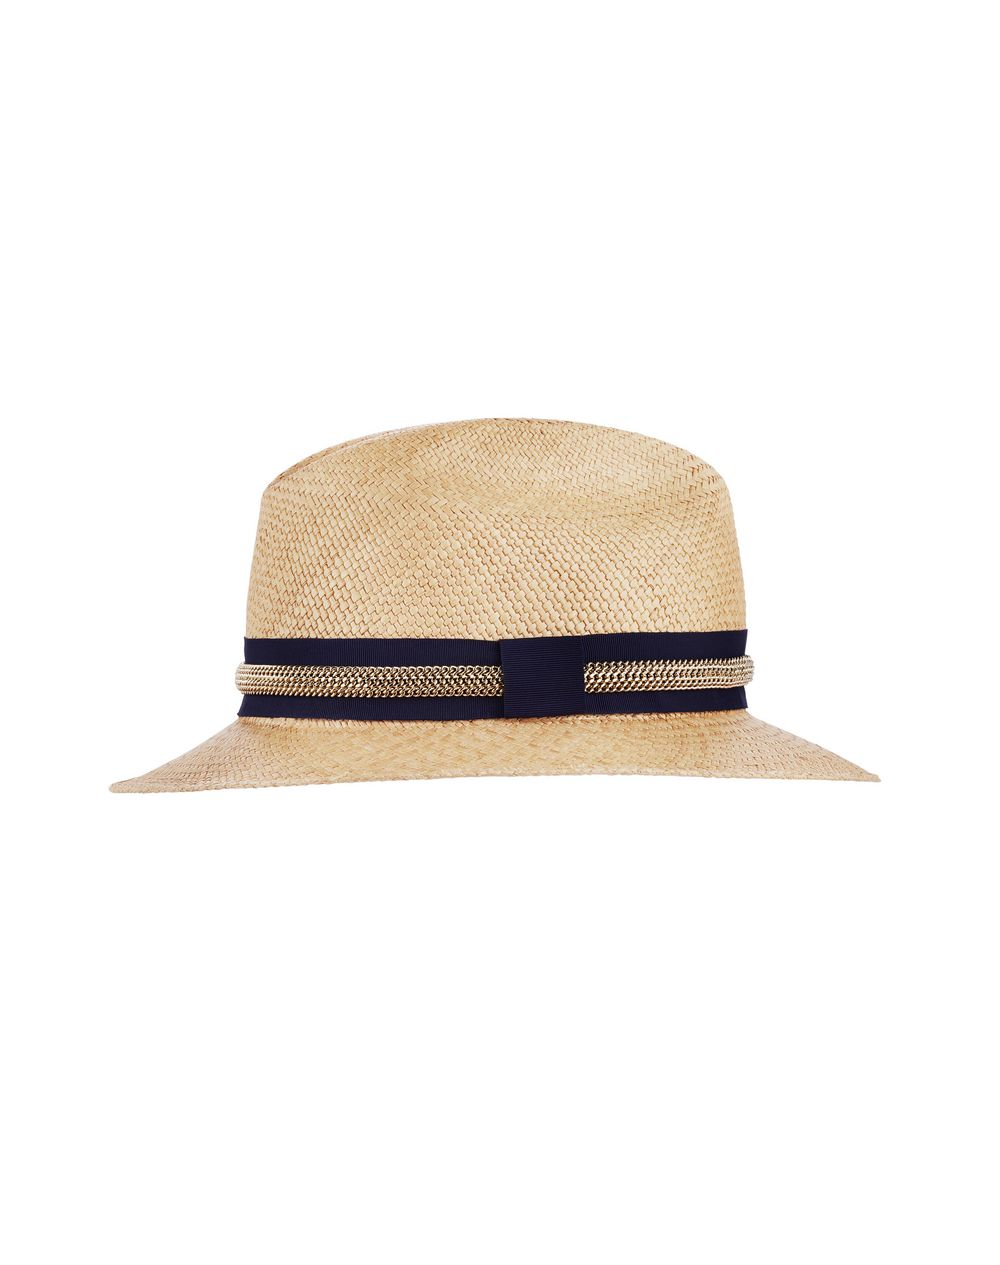 FEDORA HAT - Lanvin